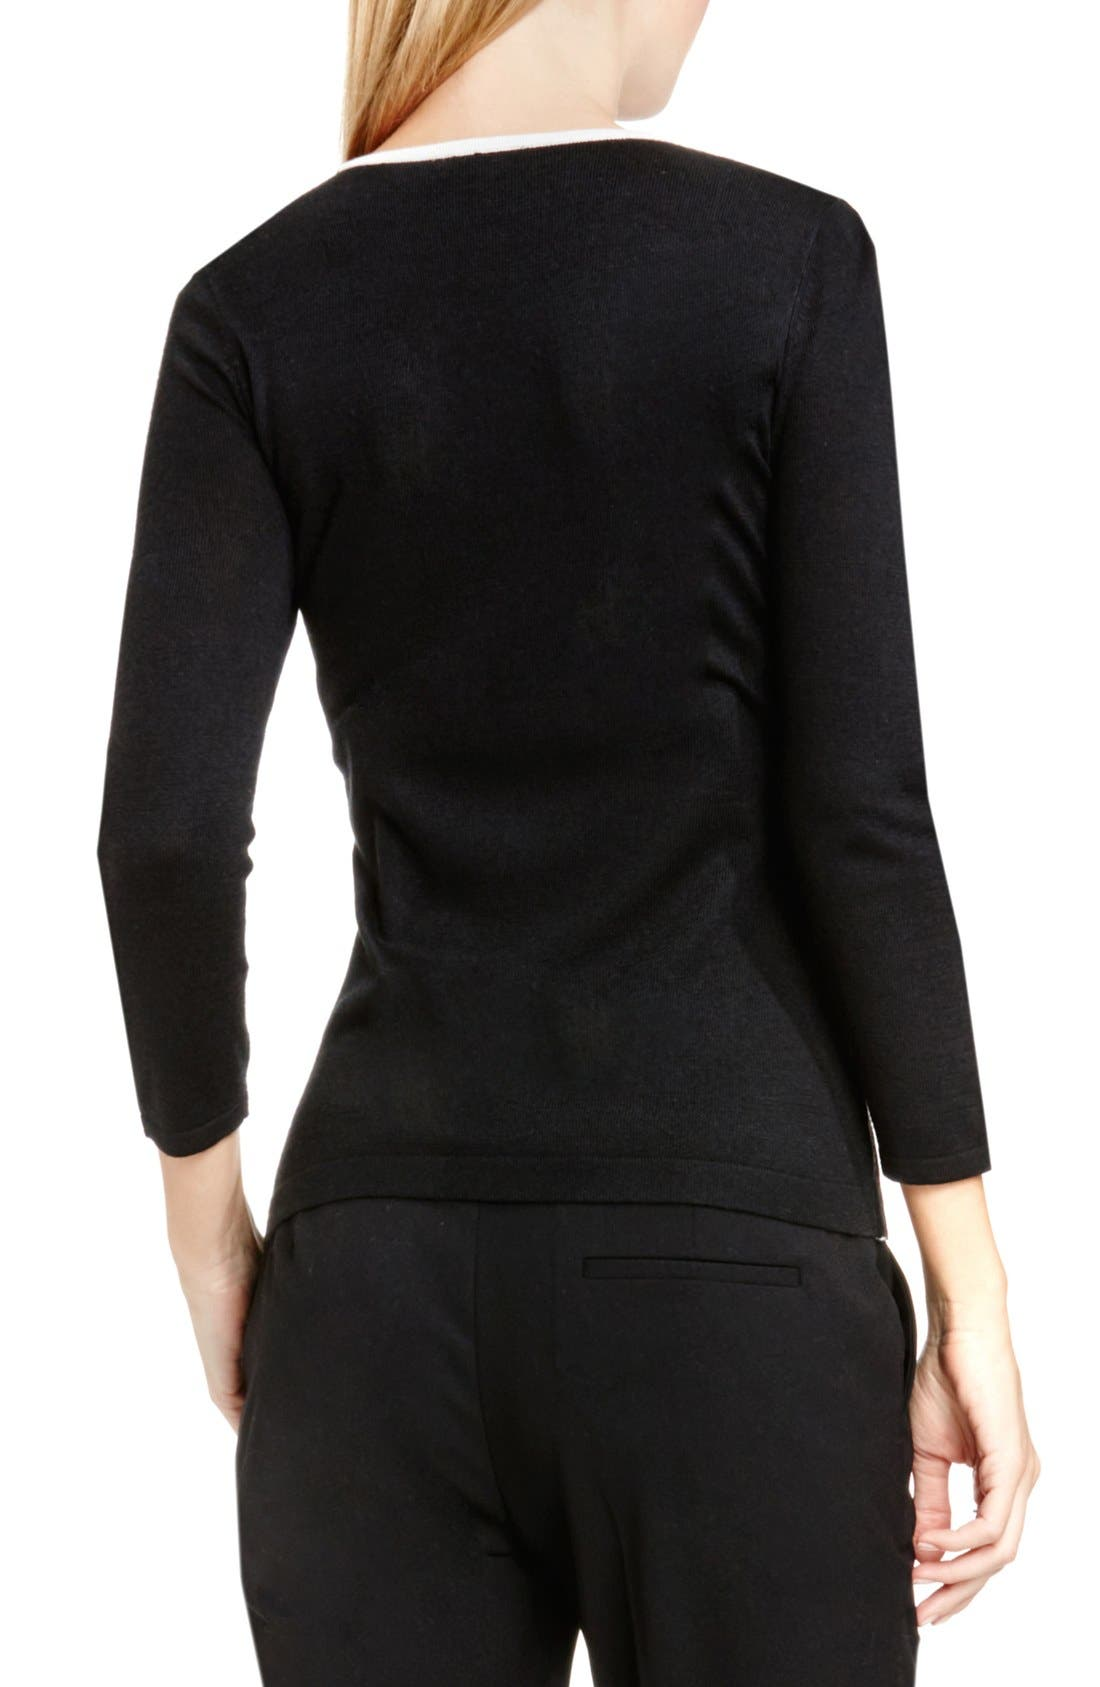 Alternate Image 2  - Vince Camuto Side Lace Trim Sweater (Regular & Petite)